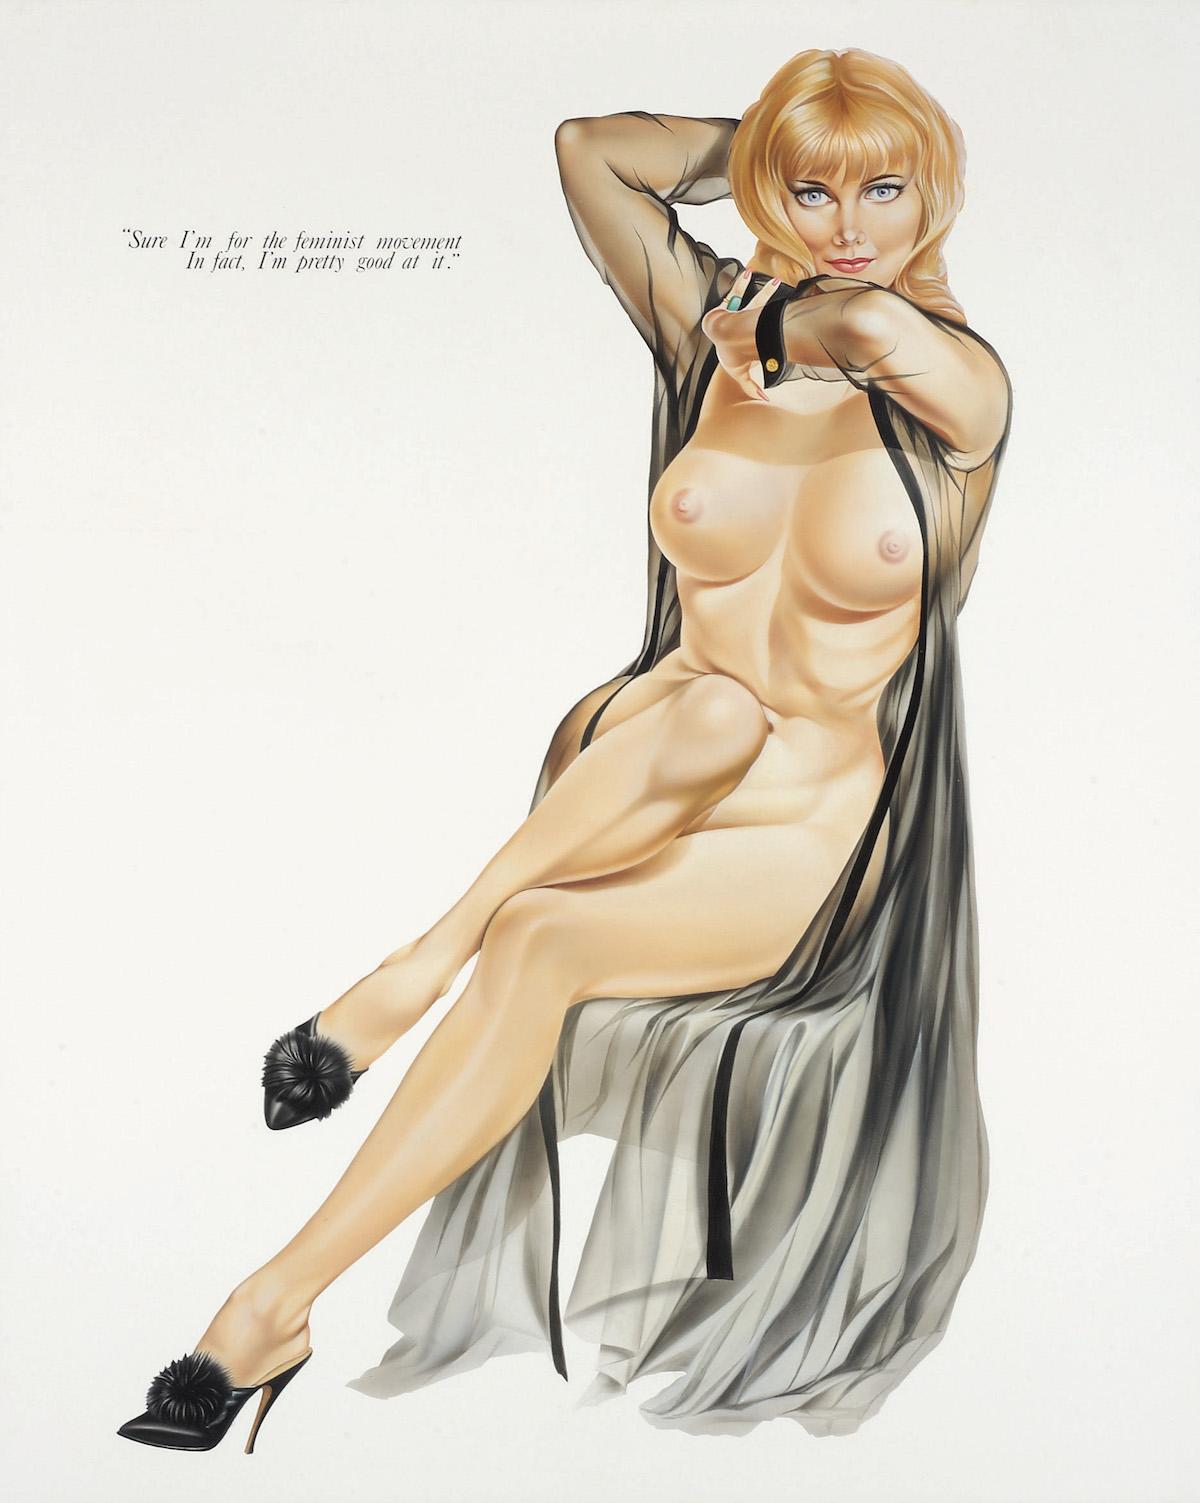 Lutz Bacher, Playboys (Feminist Movement), 1993. Courtesy Lutz Bacher, Greene Naftali; New York and Galerie Bucholz, Köln/Berlin/New York